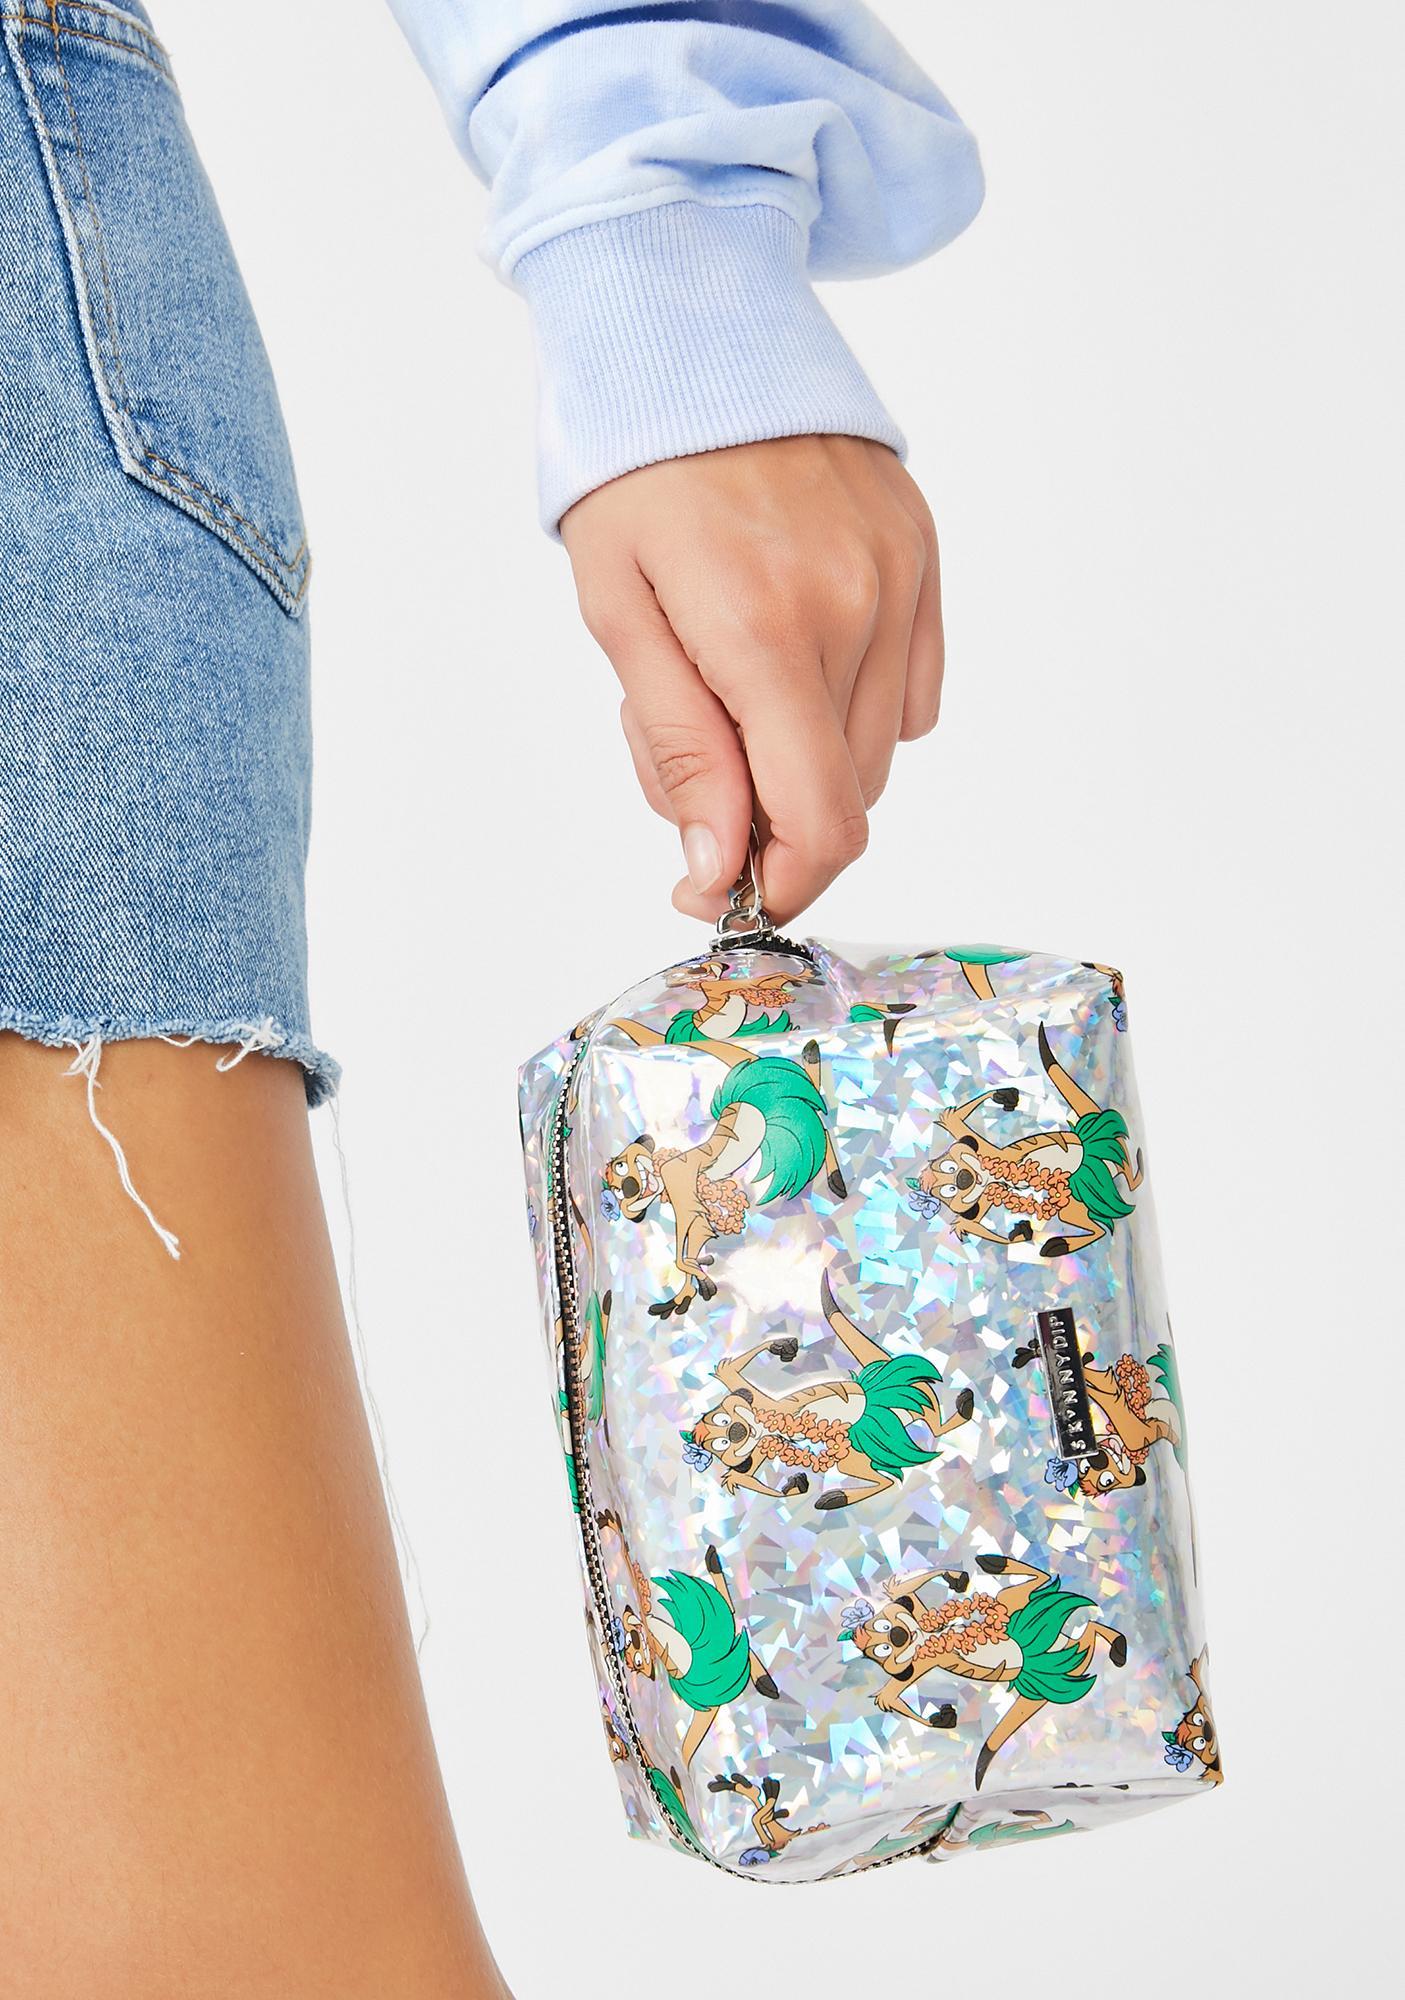 Skinnydip X Disney Timon Makeup Bag